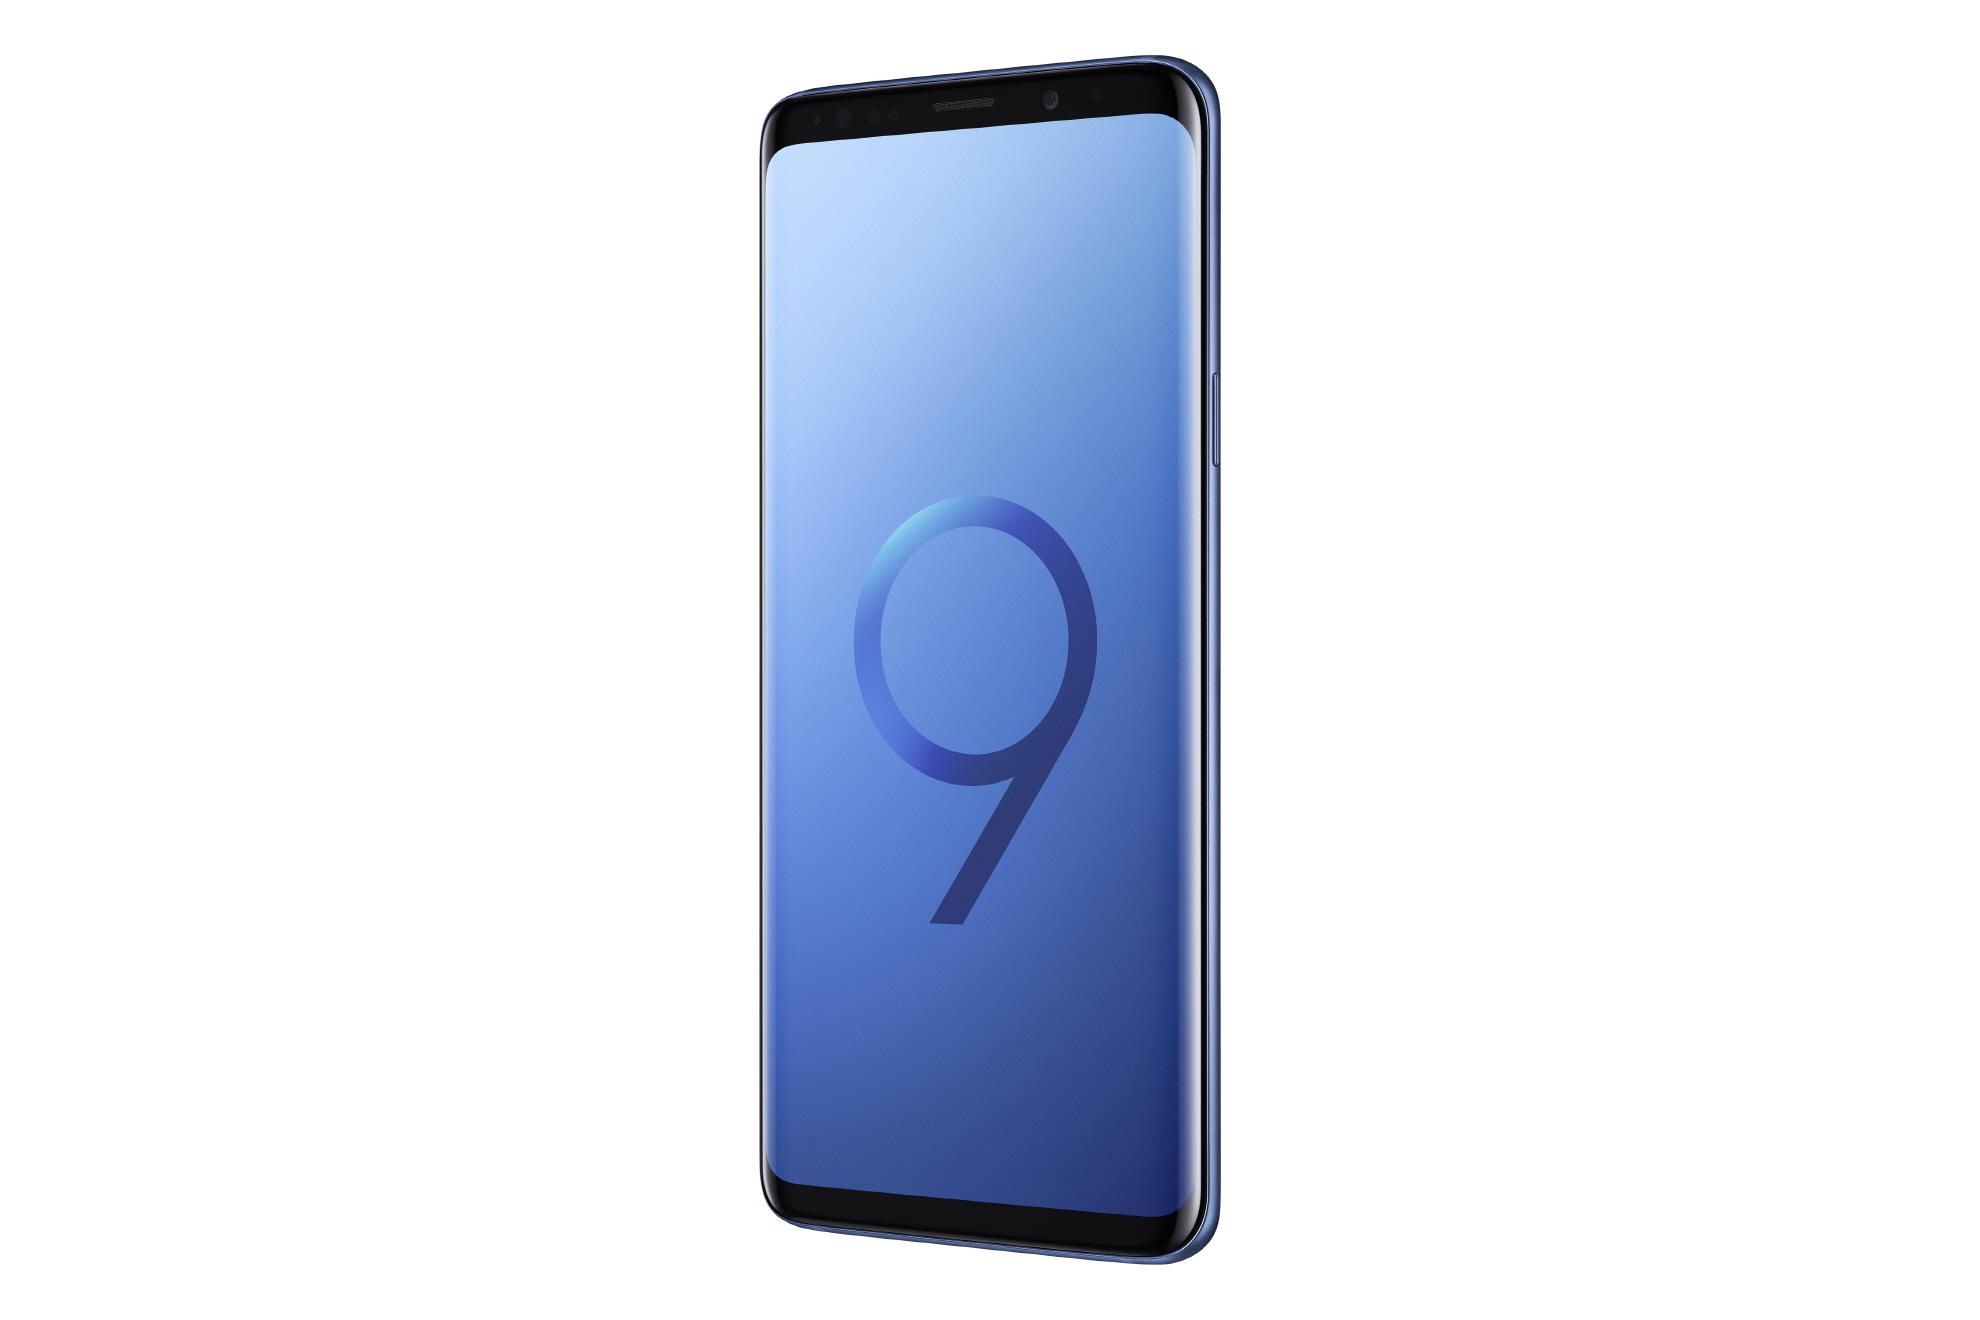 Samsung_Galaxy_S9_Plus_gallery_4